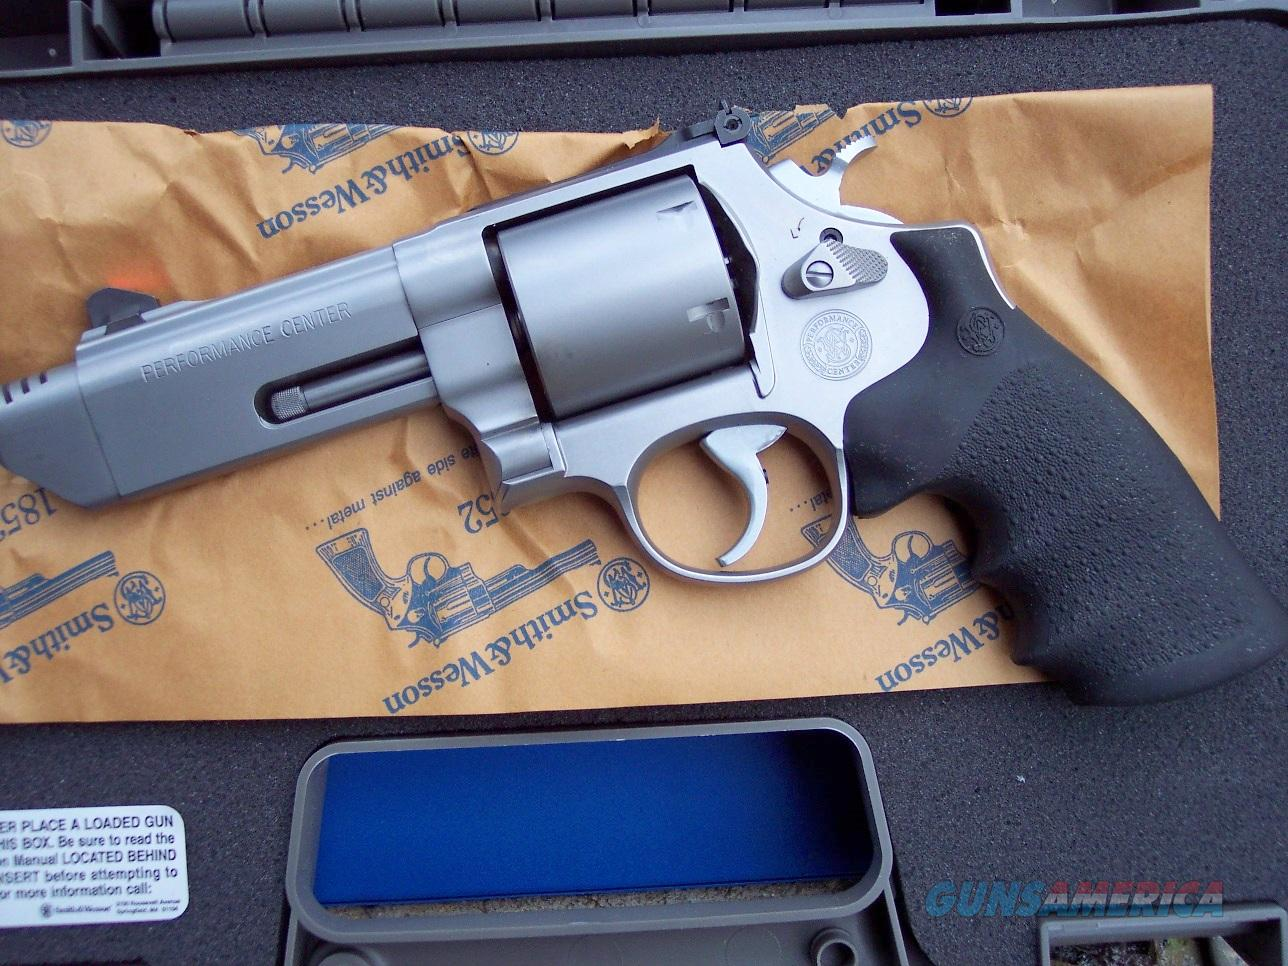 Smith & Wesson 629 Performance Center V Comp 44 Mag 170137 *NEW*  Guns > Pistols > Smith & Wesson Revolvers > Performance Center